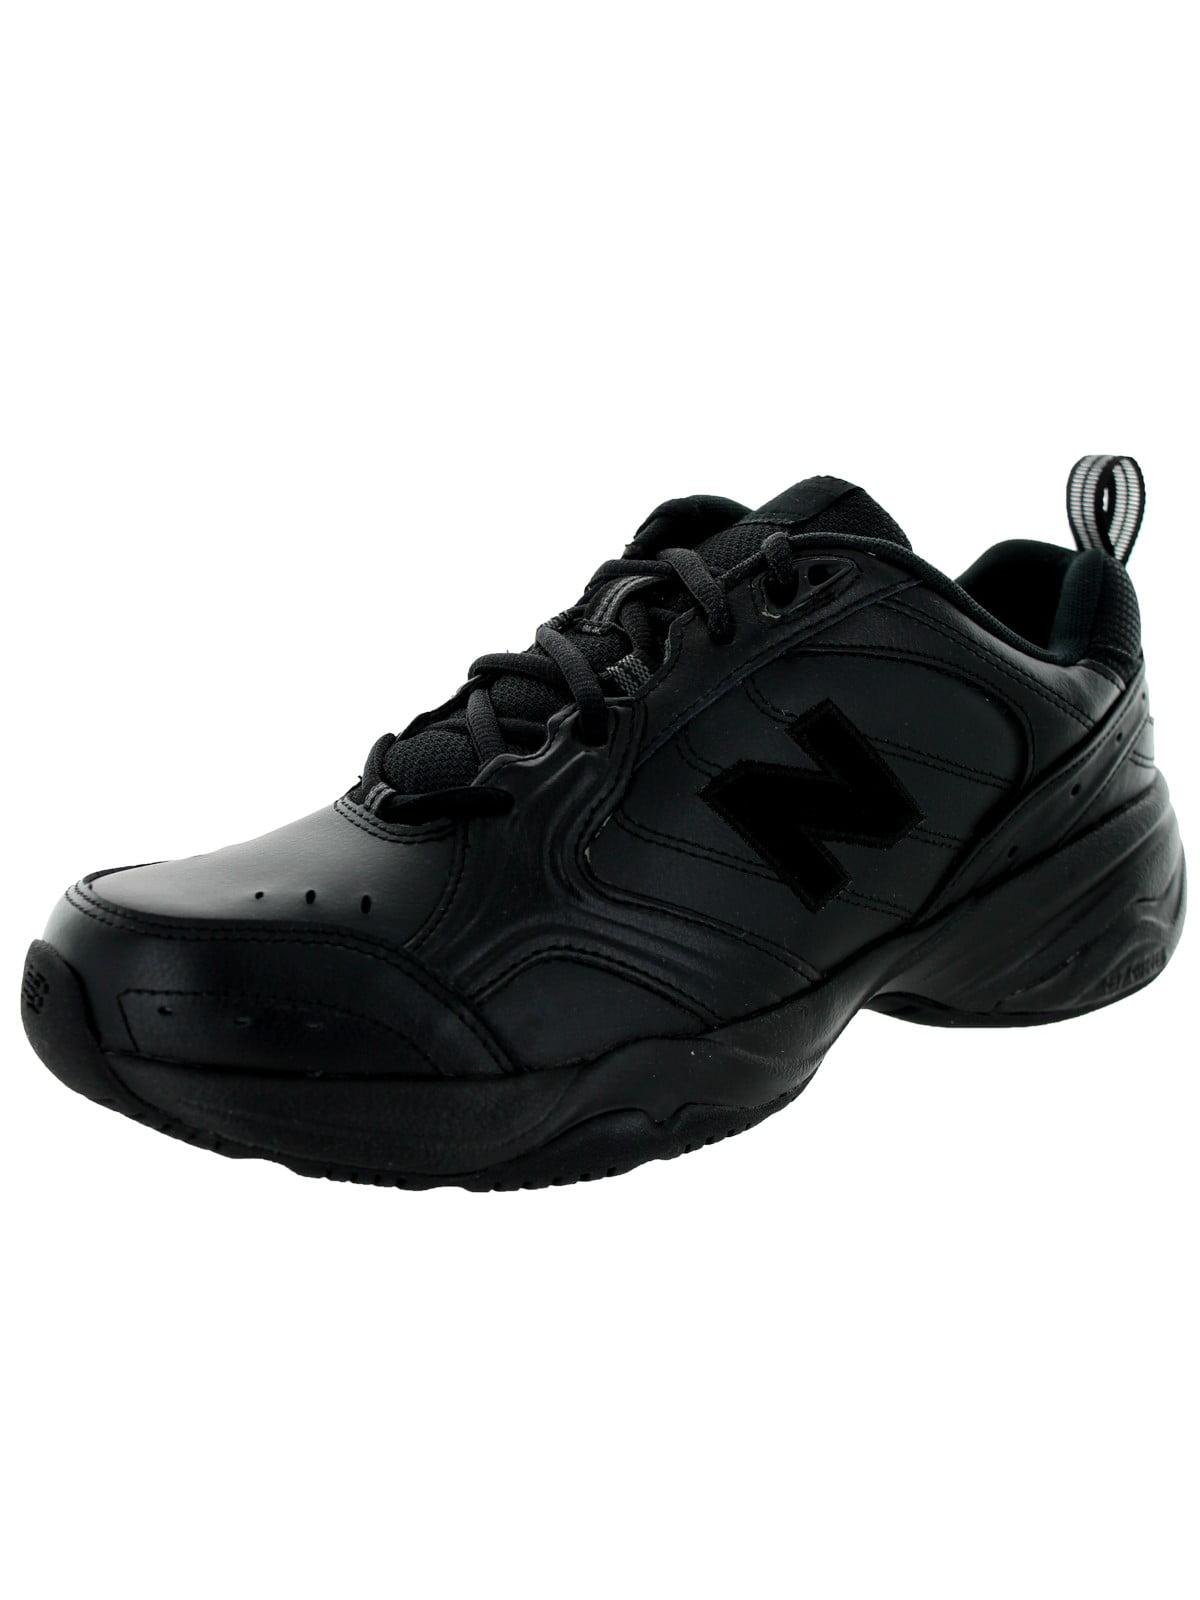 New Balance Men's 624 Training Shoe